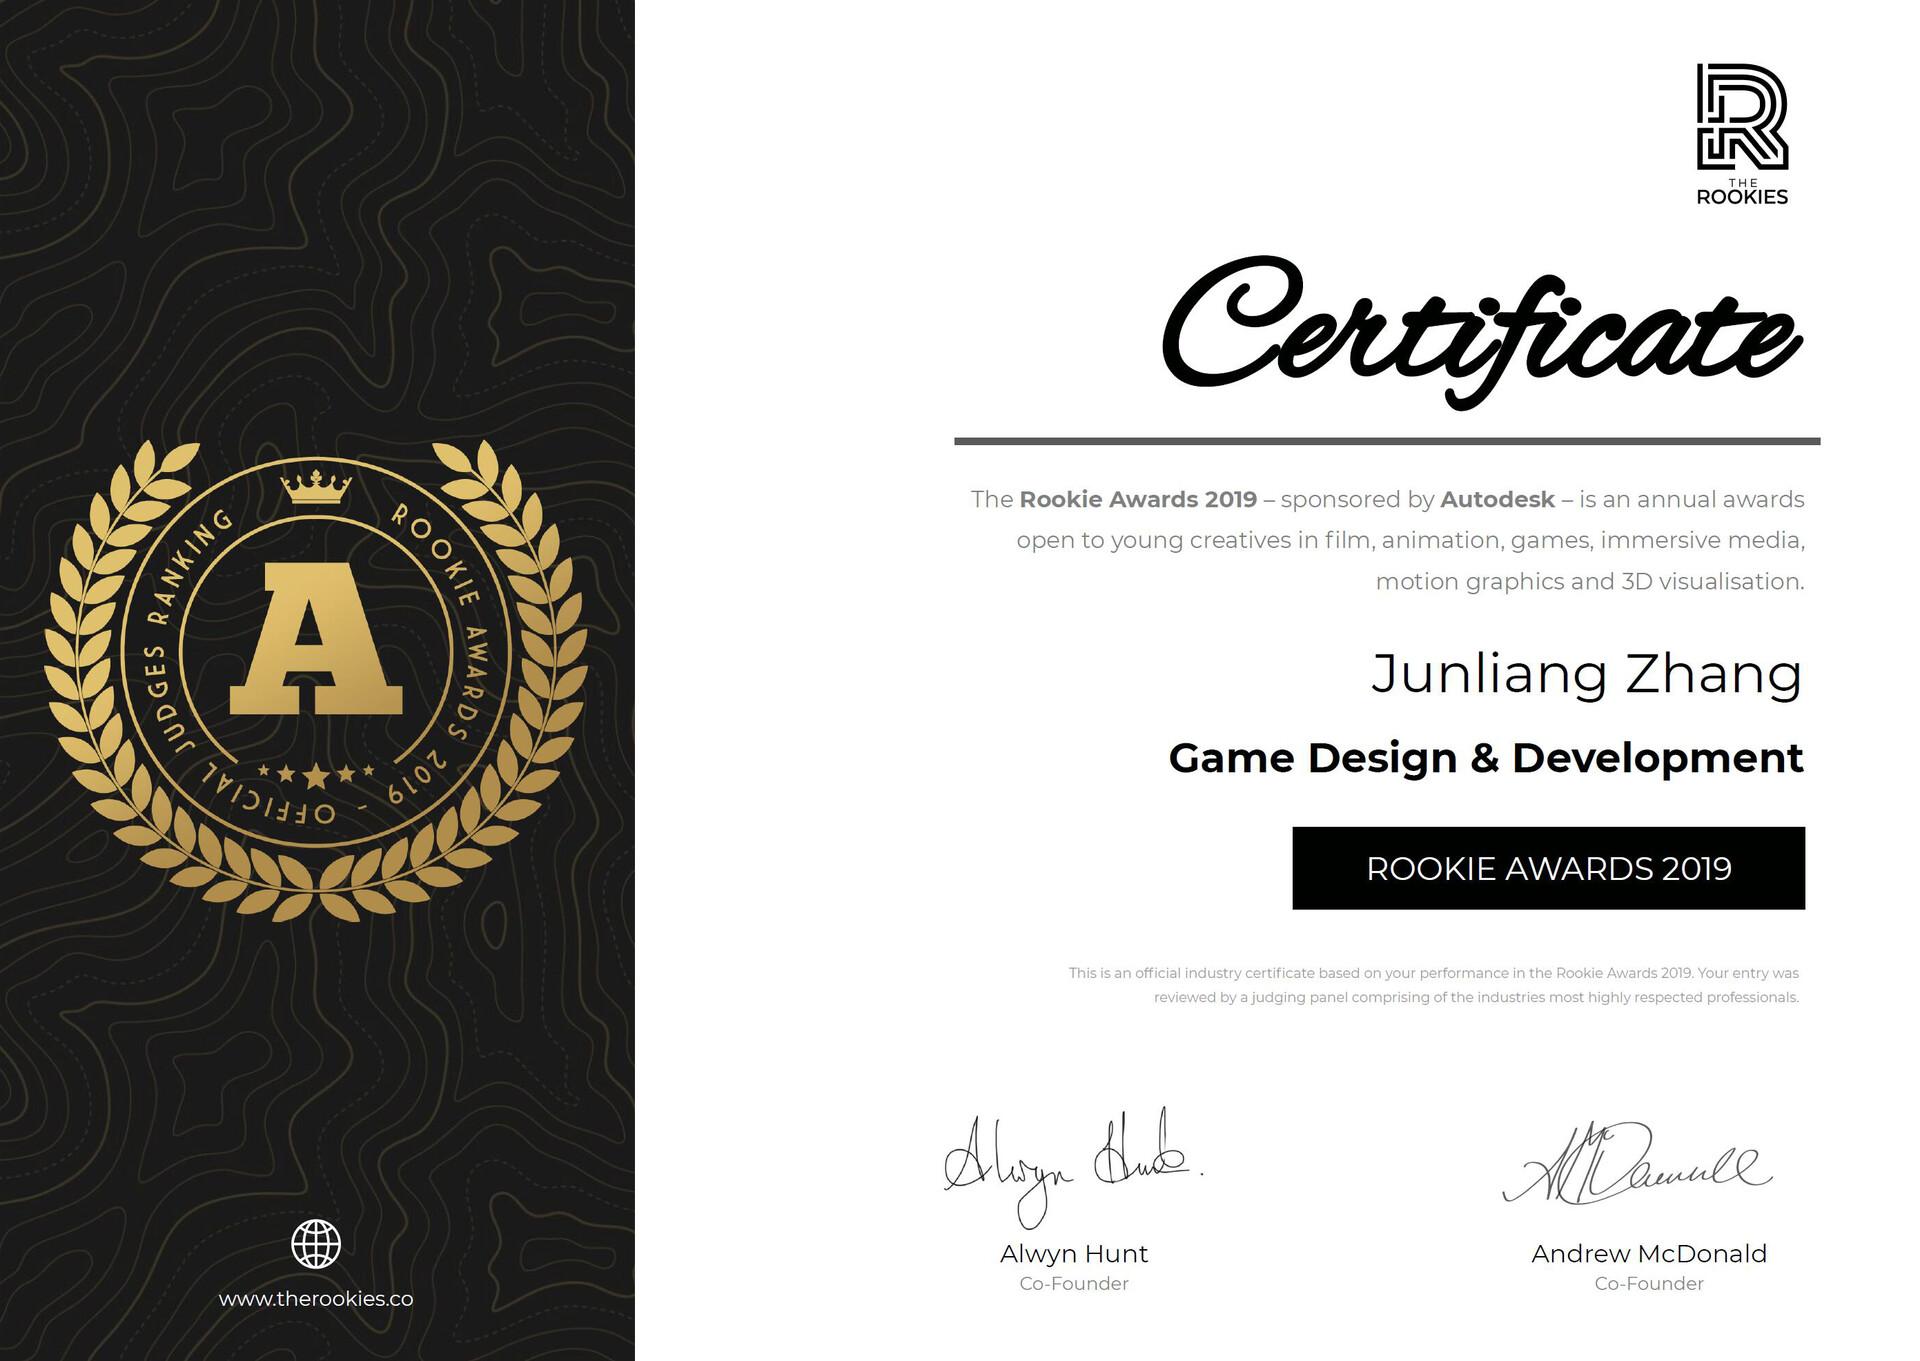 Junliang zhang ookie awards 2019 rank a certificate